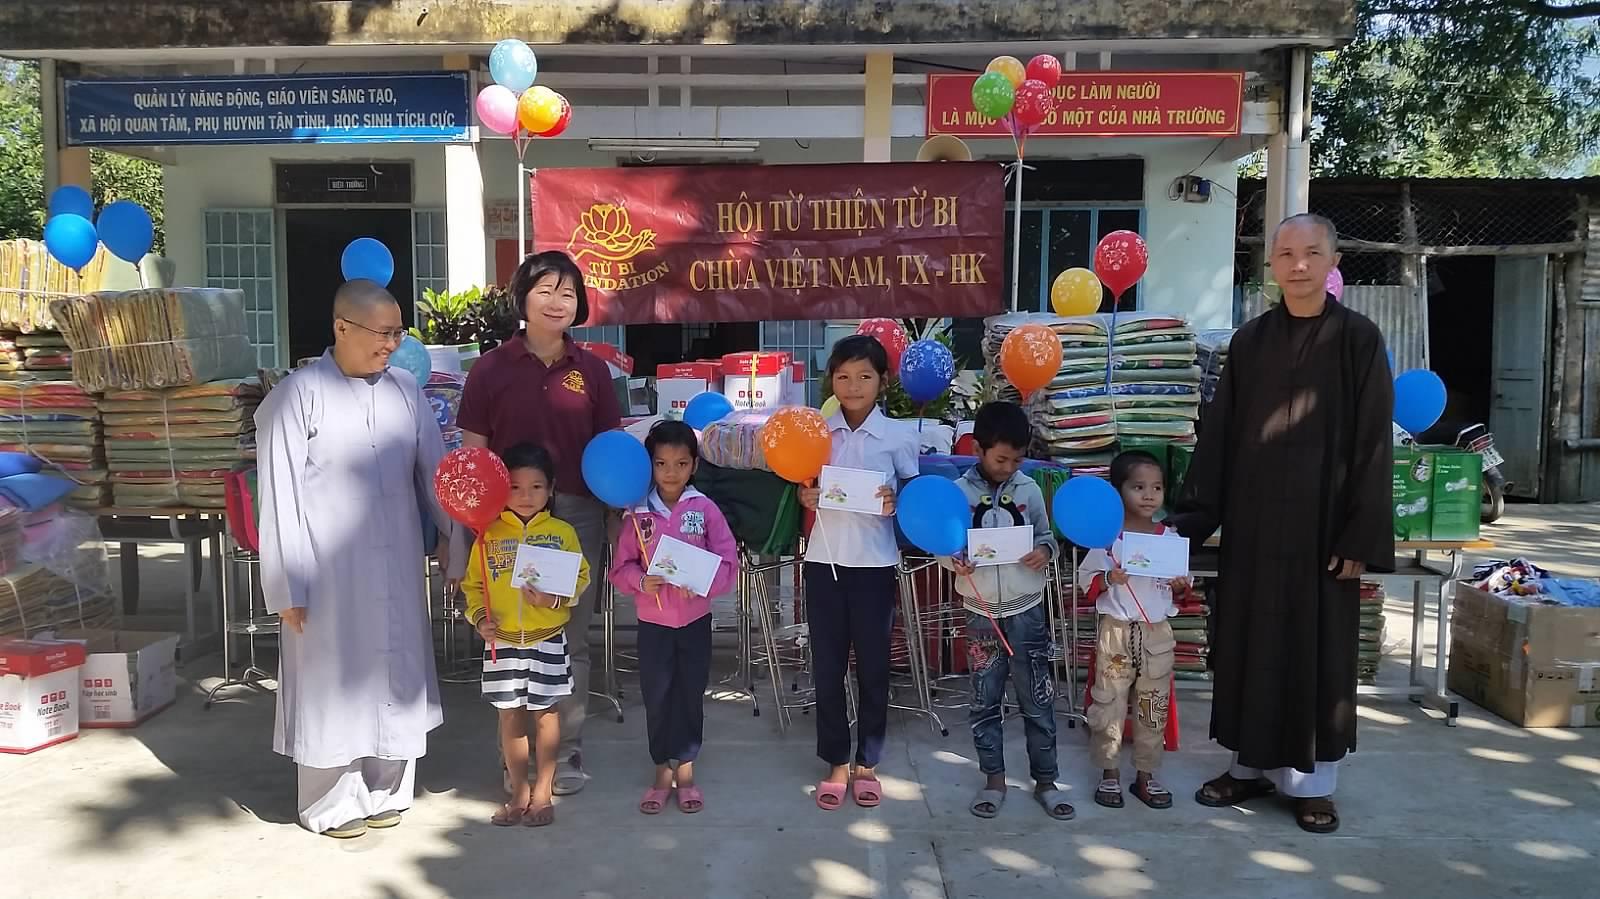 TQ Tieu Hoc Khanh Thuong 53